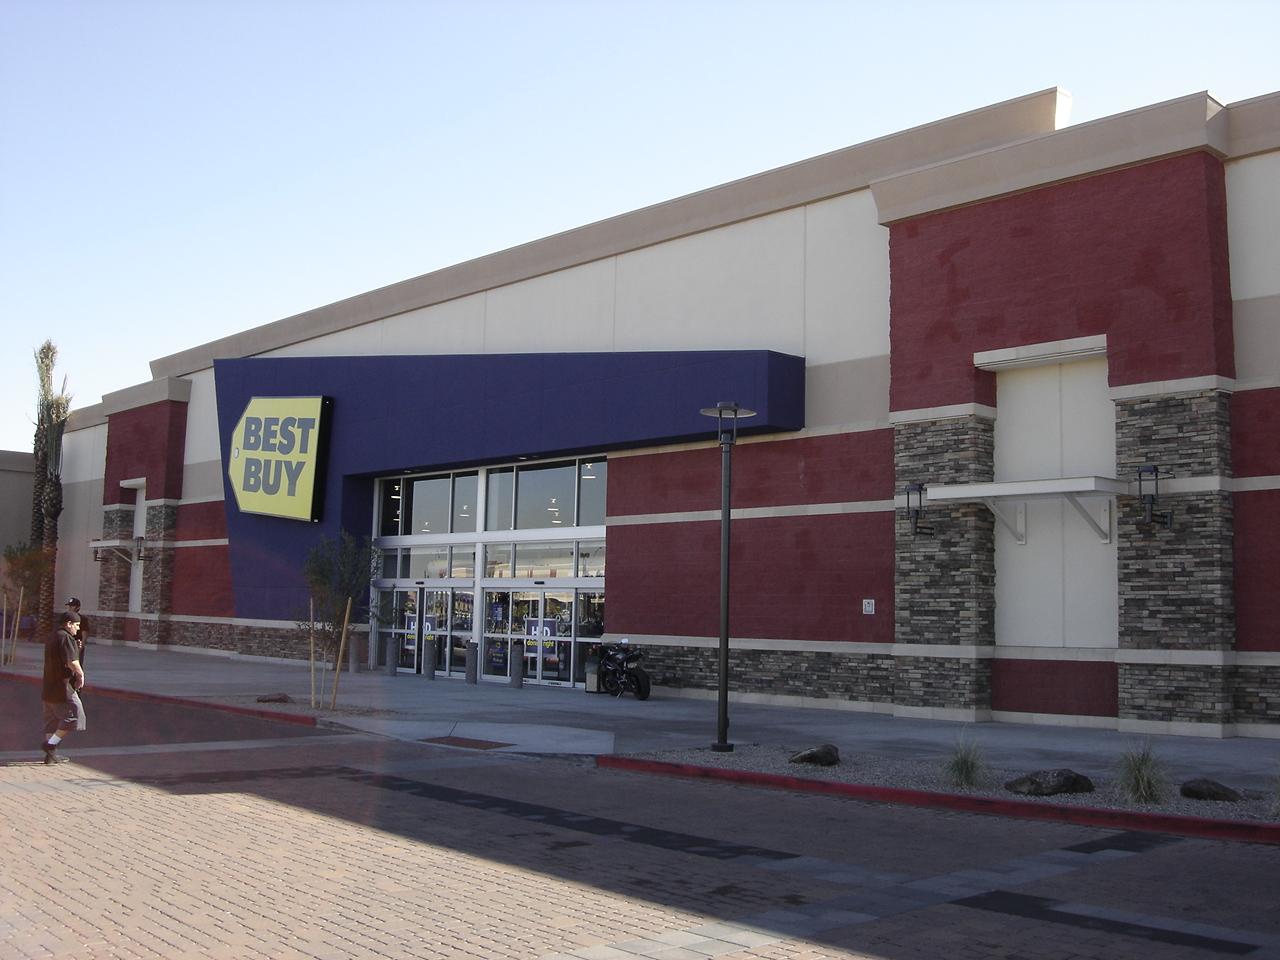 ADW-Retail-Restaurant-Gateway-Crossing-Avondale-AZ-Best-Buy.jpg